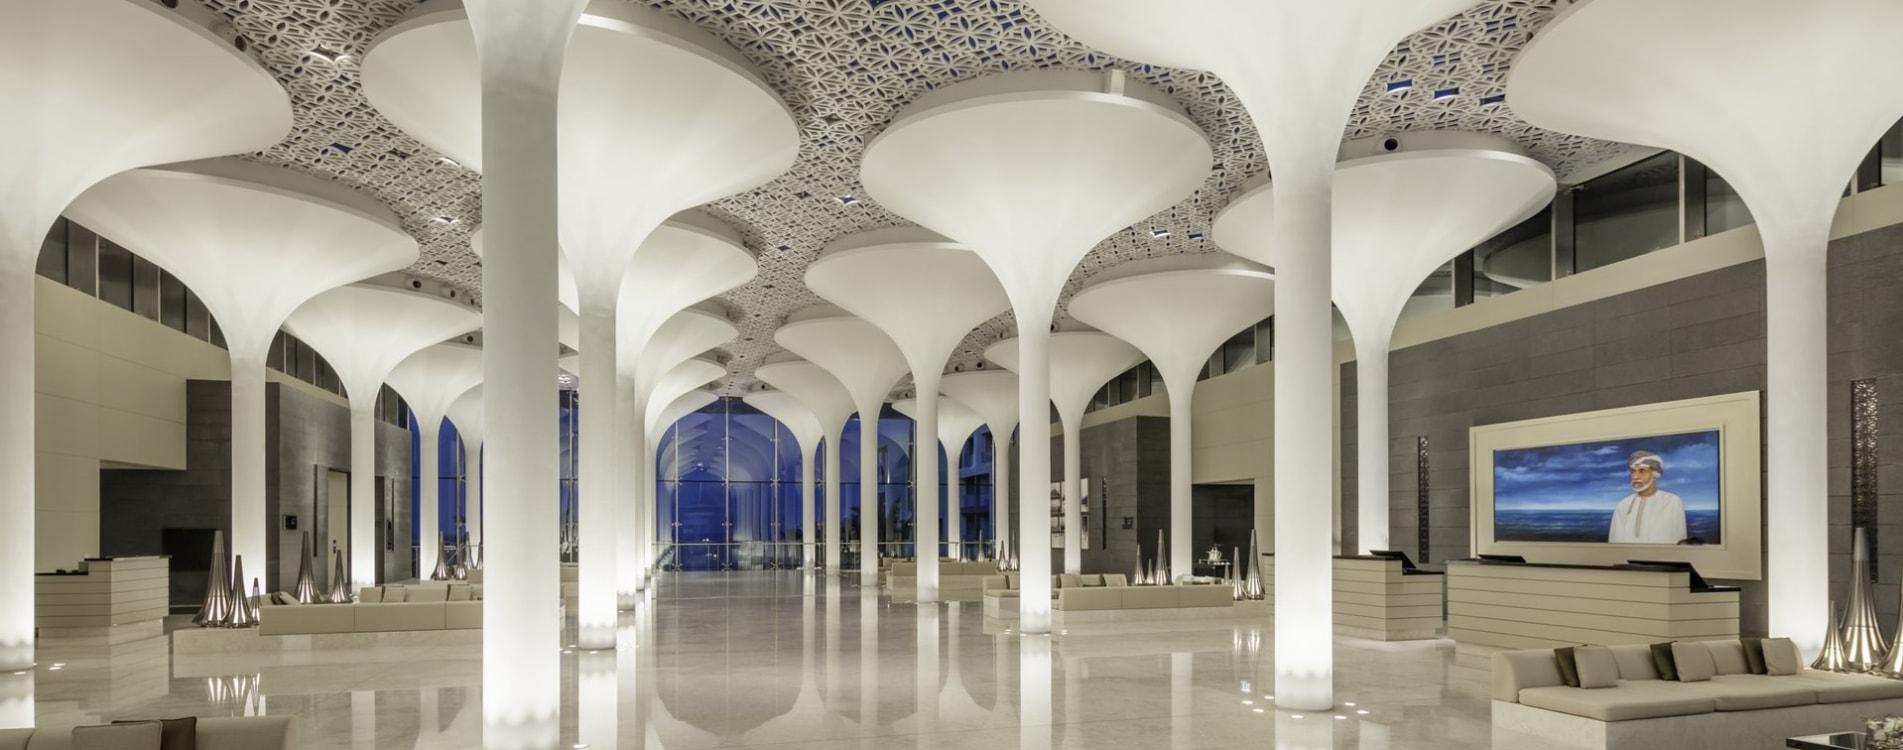 Kempinski-Hotel-Muscat-Hotel-Lobby-Oman